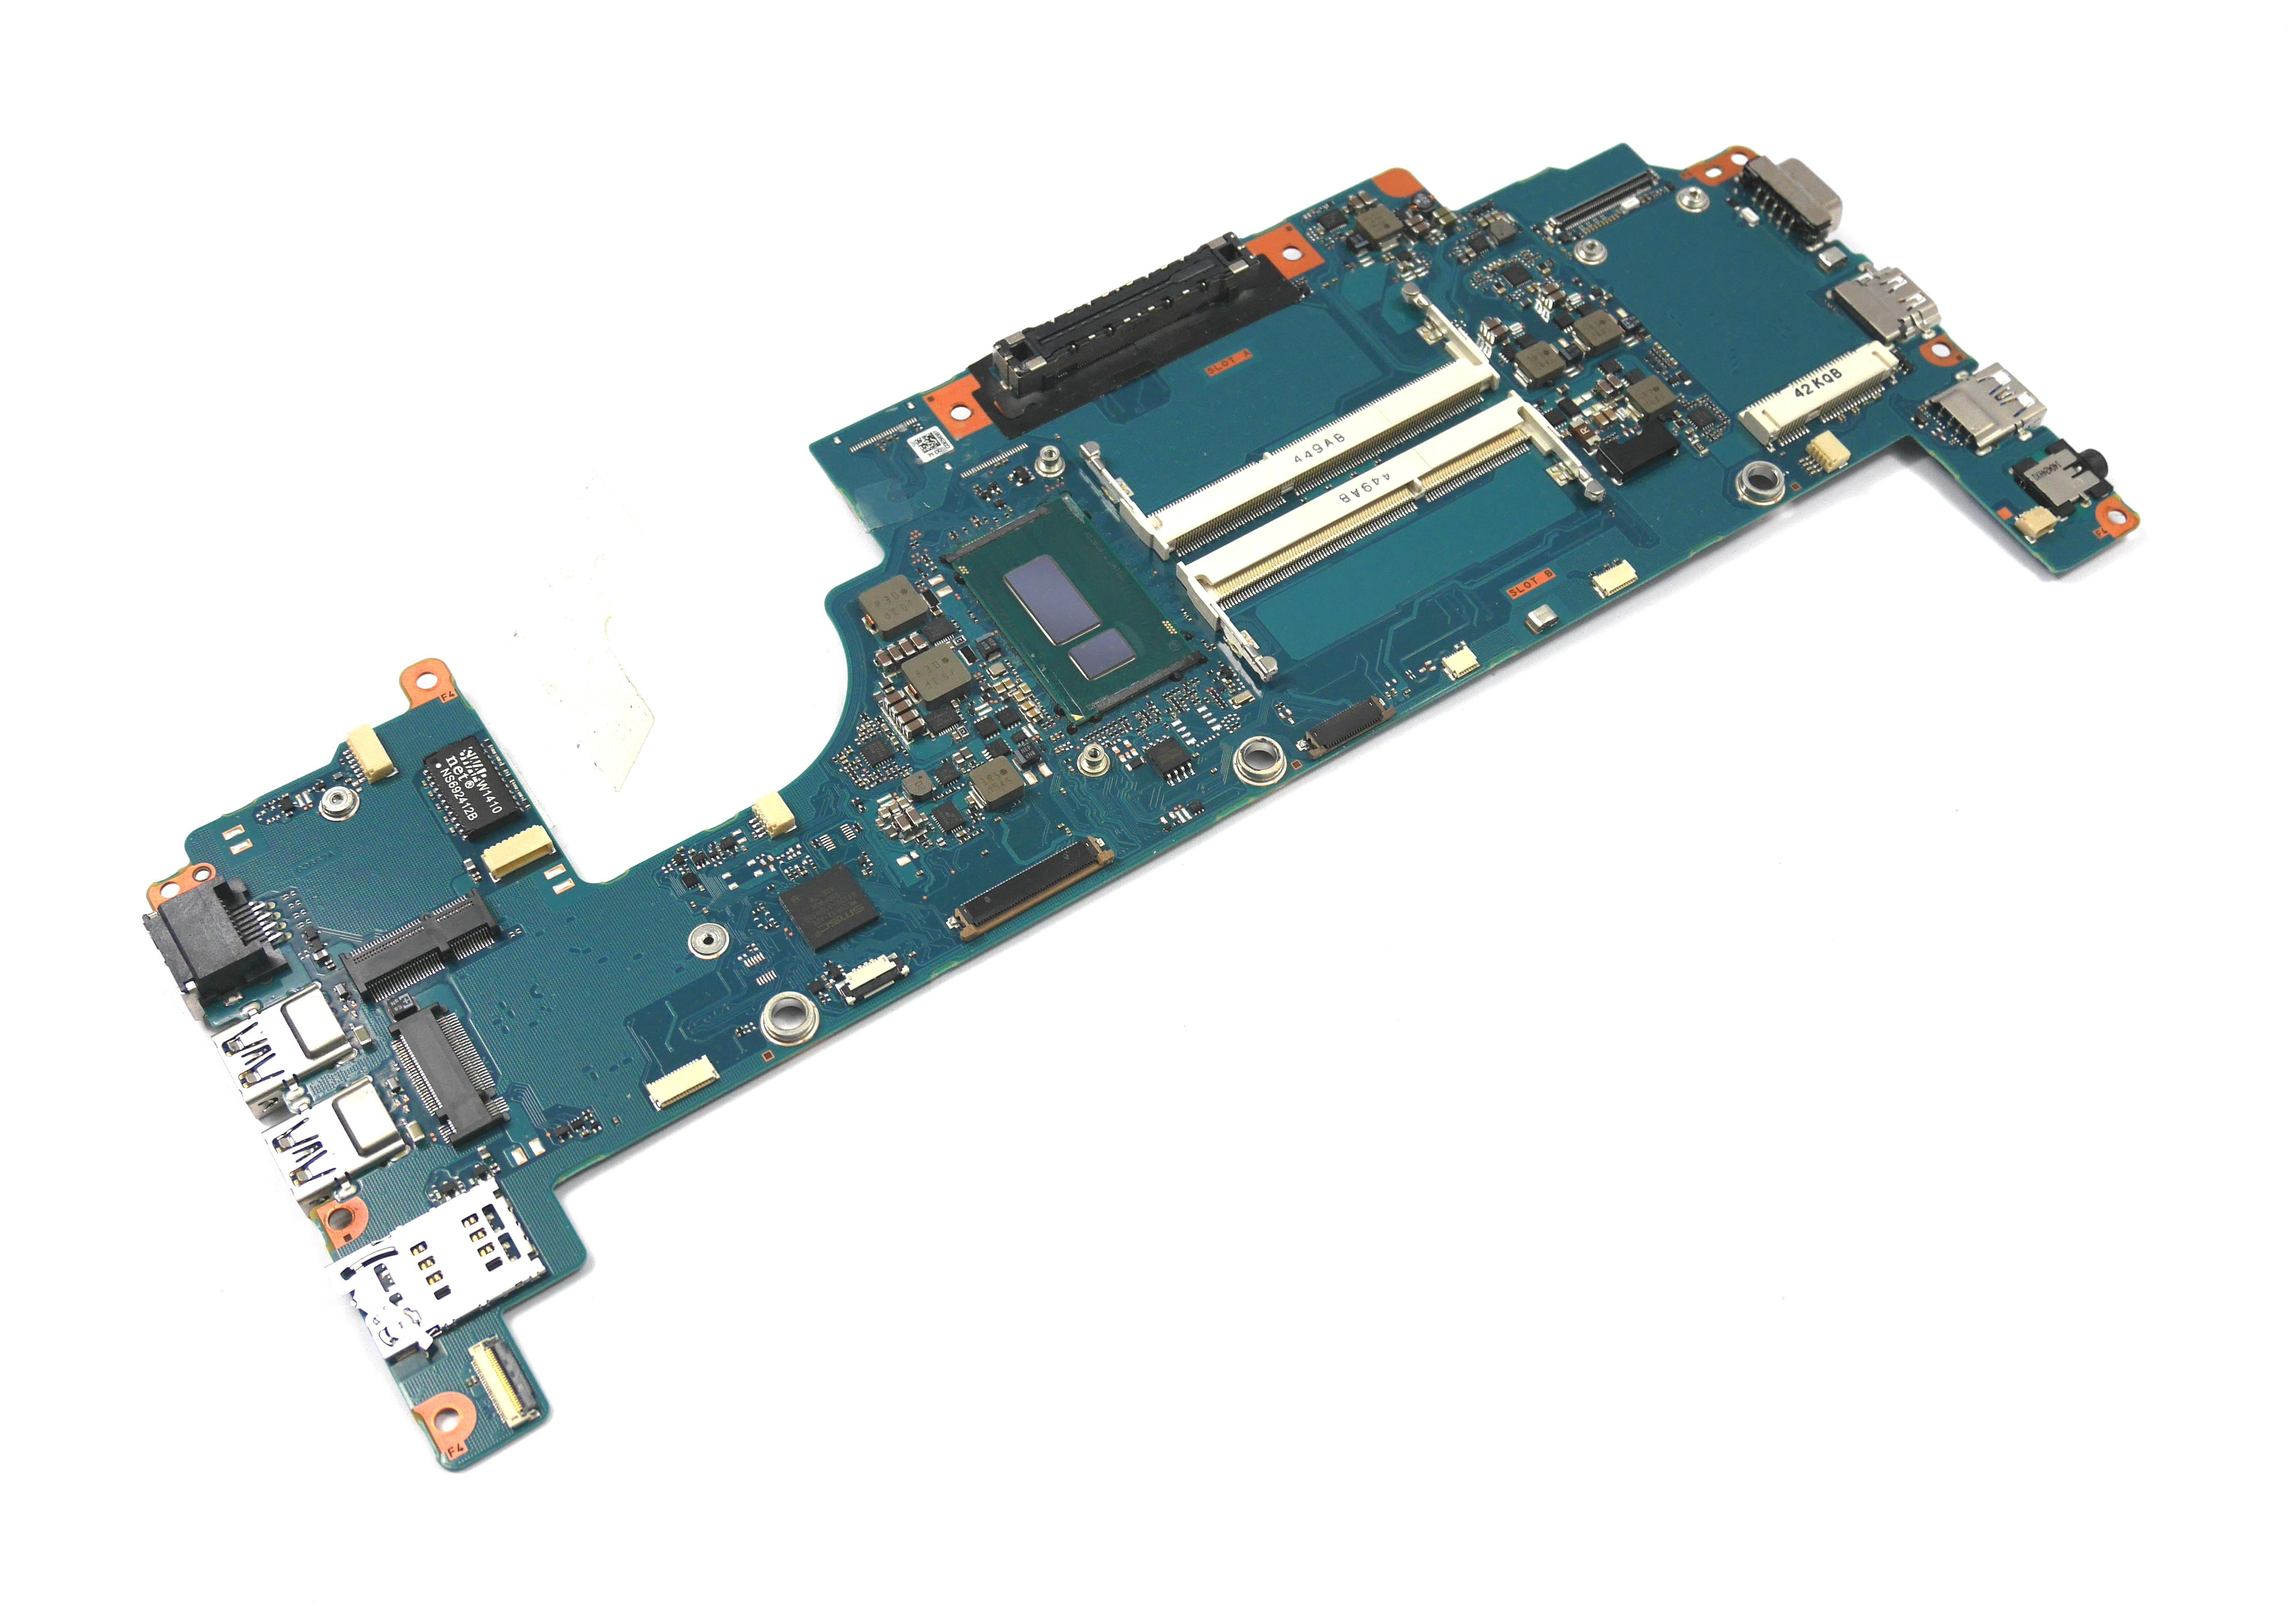 Toshiba FAUXSY3 Portege Z30-A-10P Motherboard with Intel i5-4300U CPU - A3667A